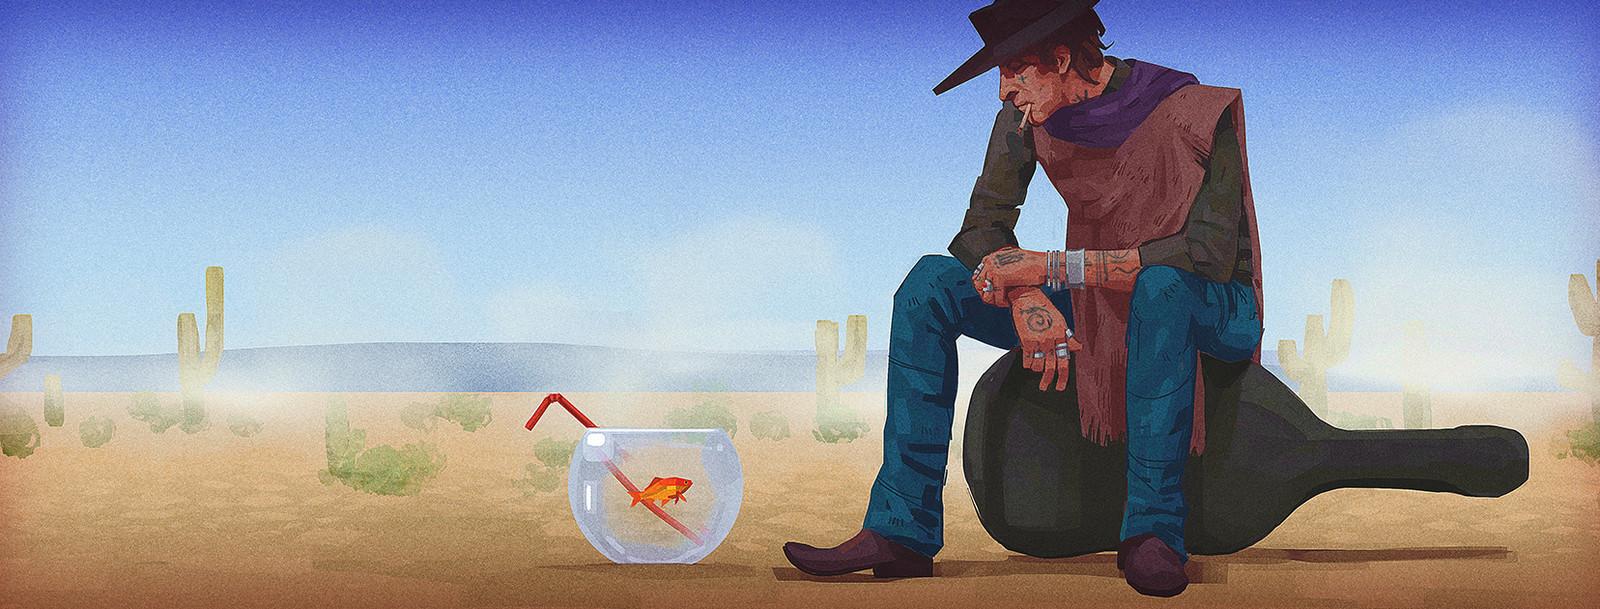 Tears of a western man